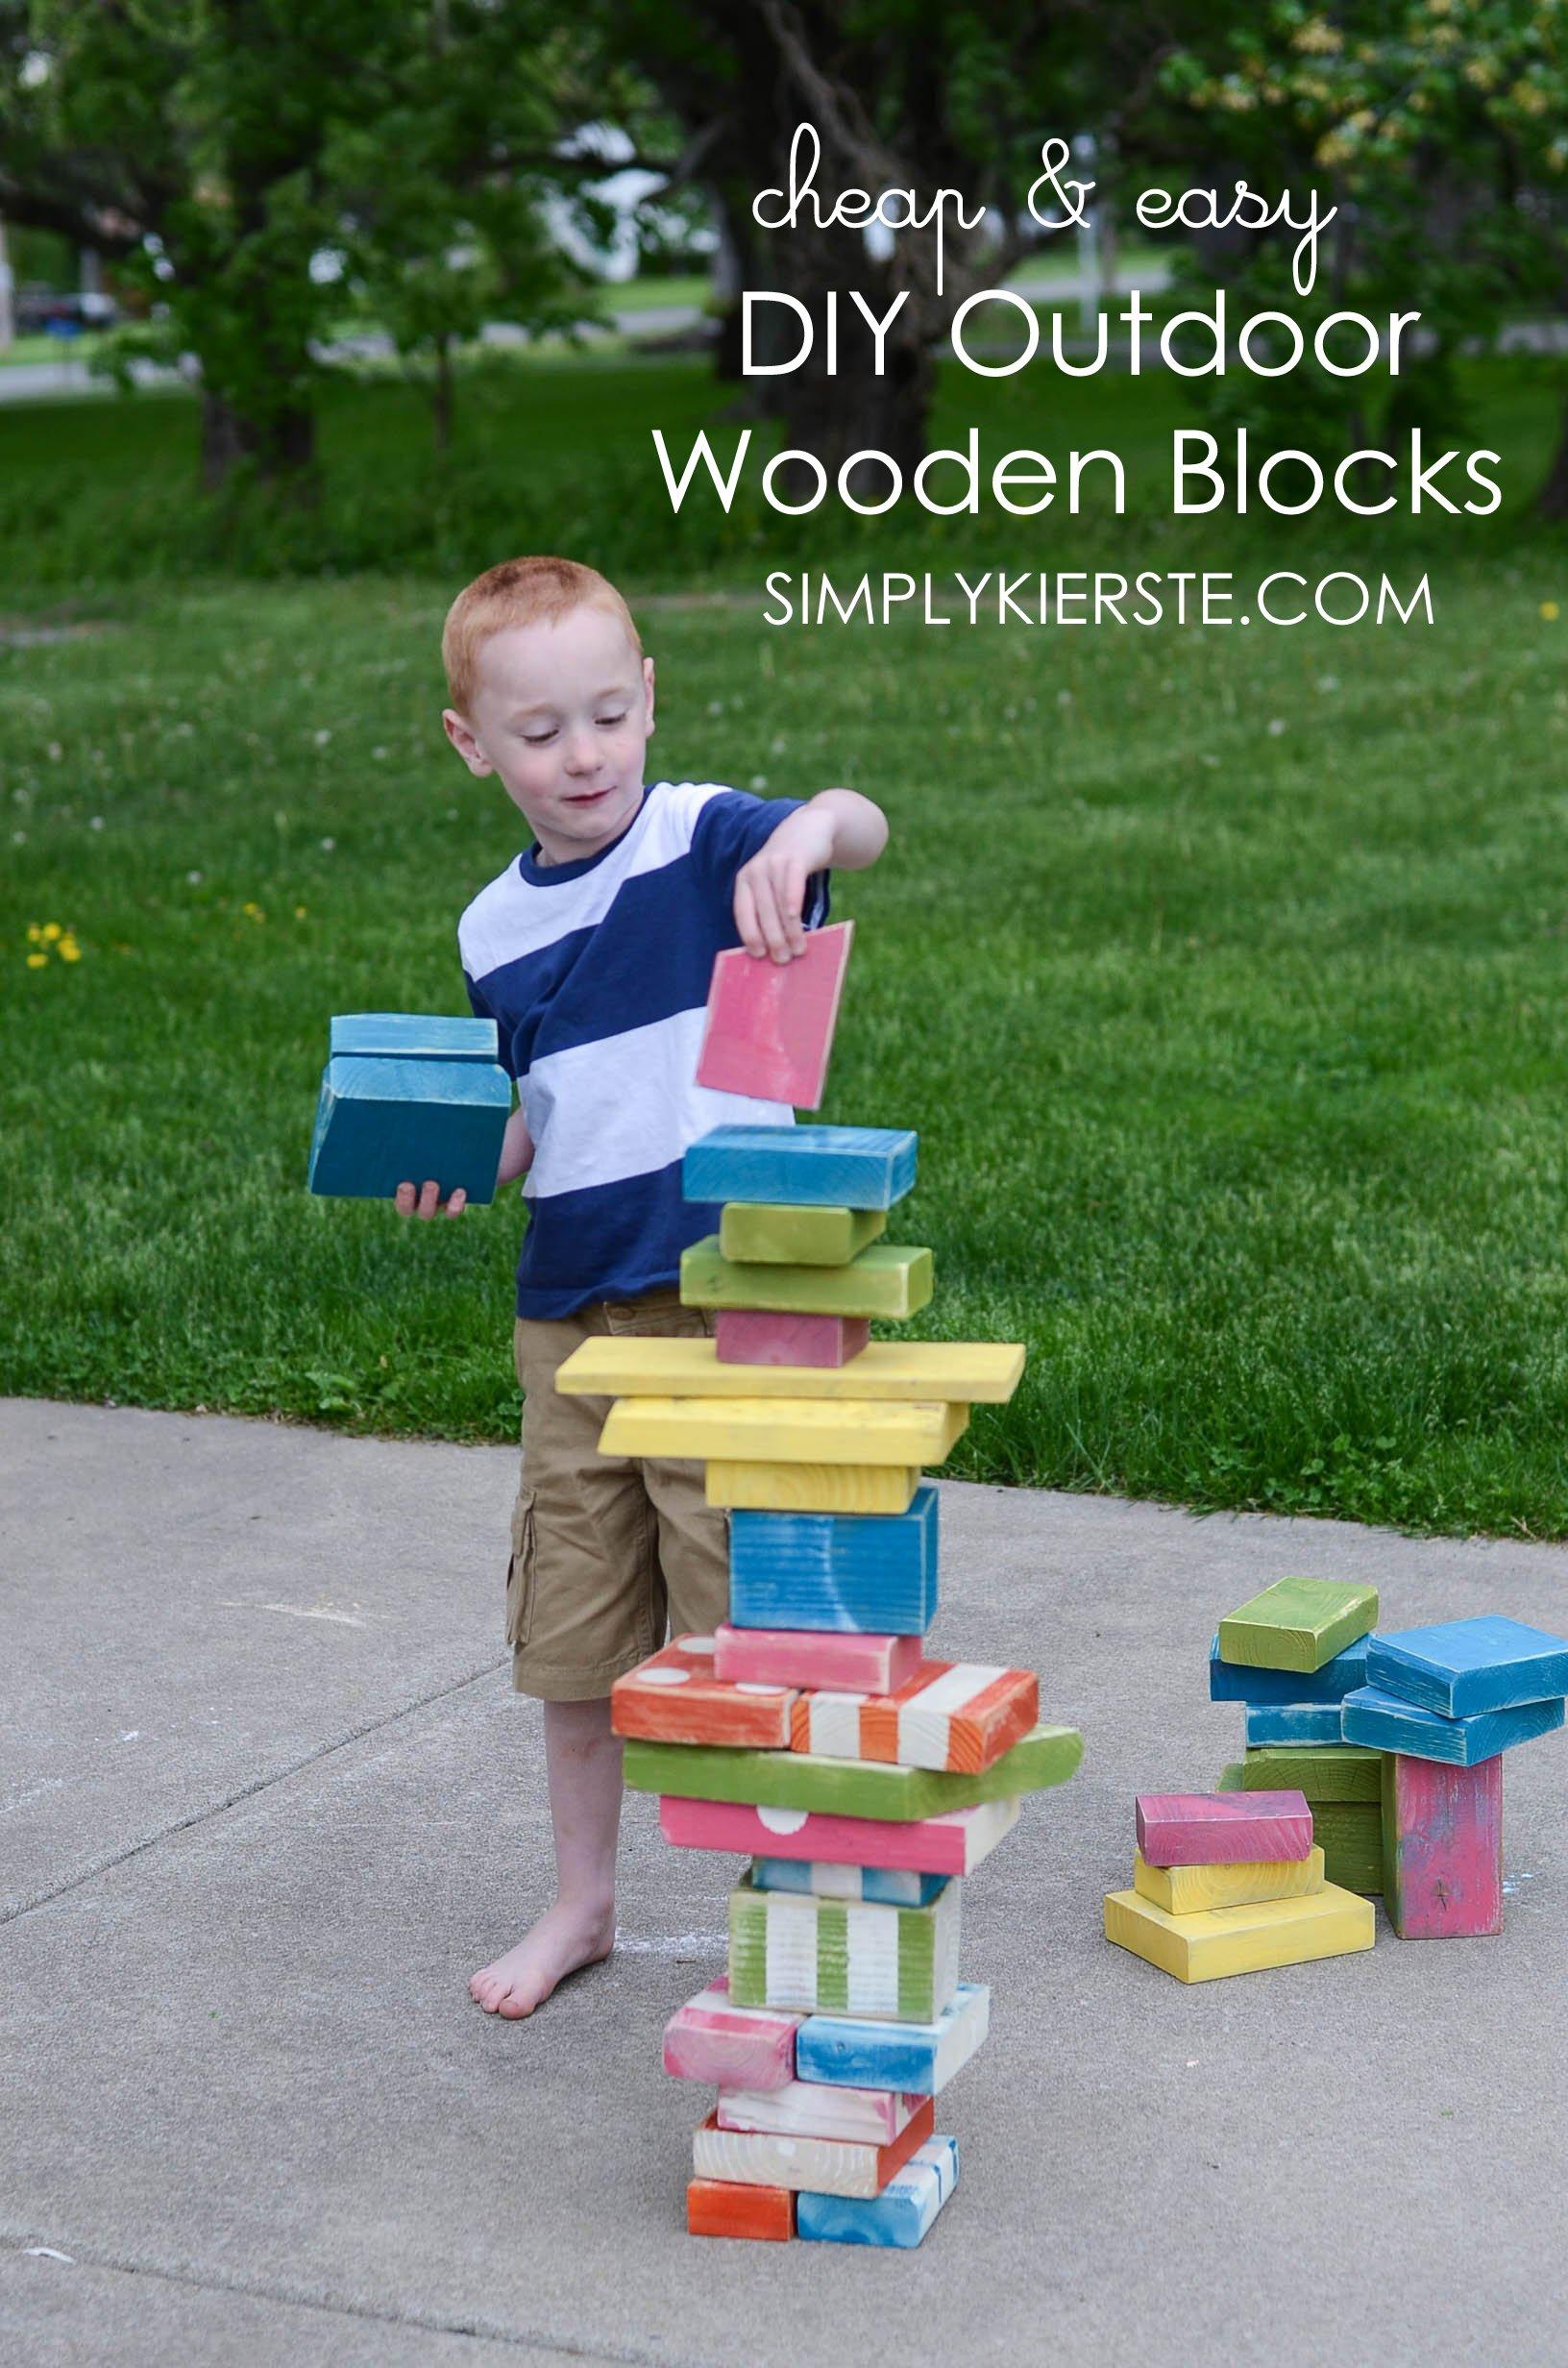 Cheap & easy DIY outdoor wooden blocks